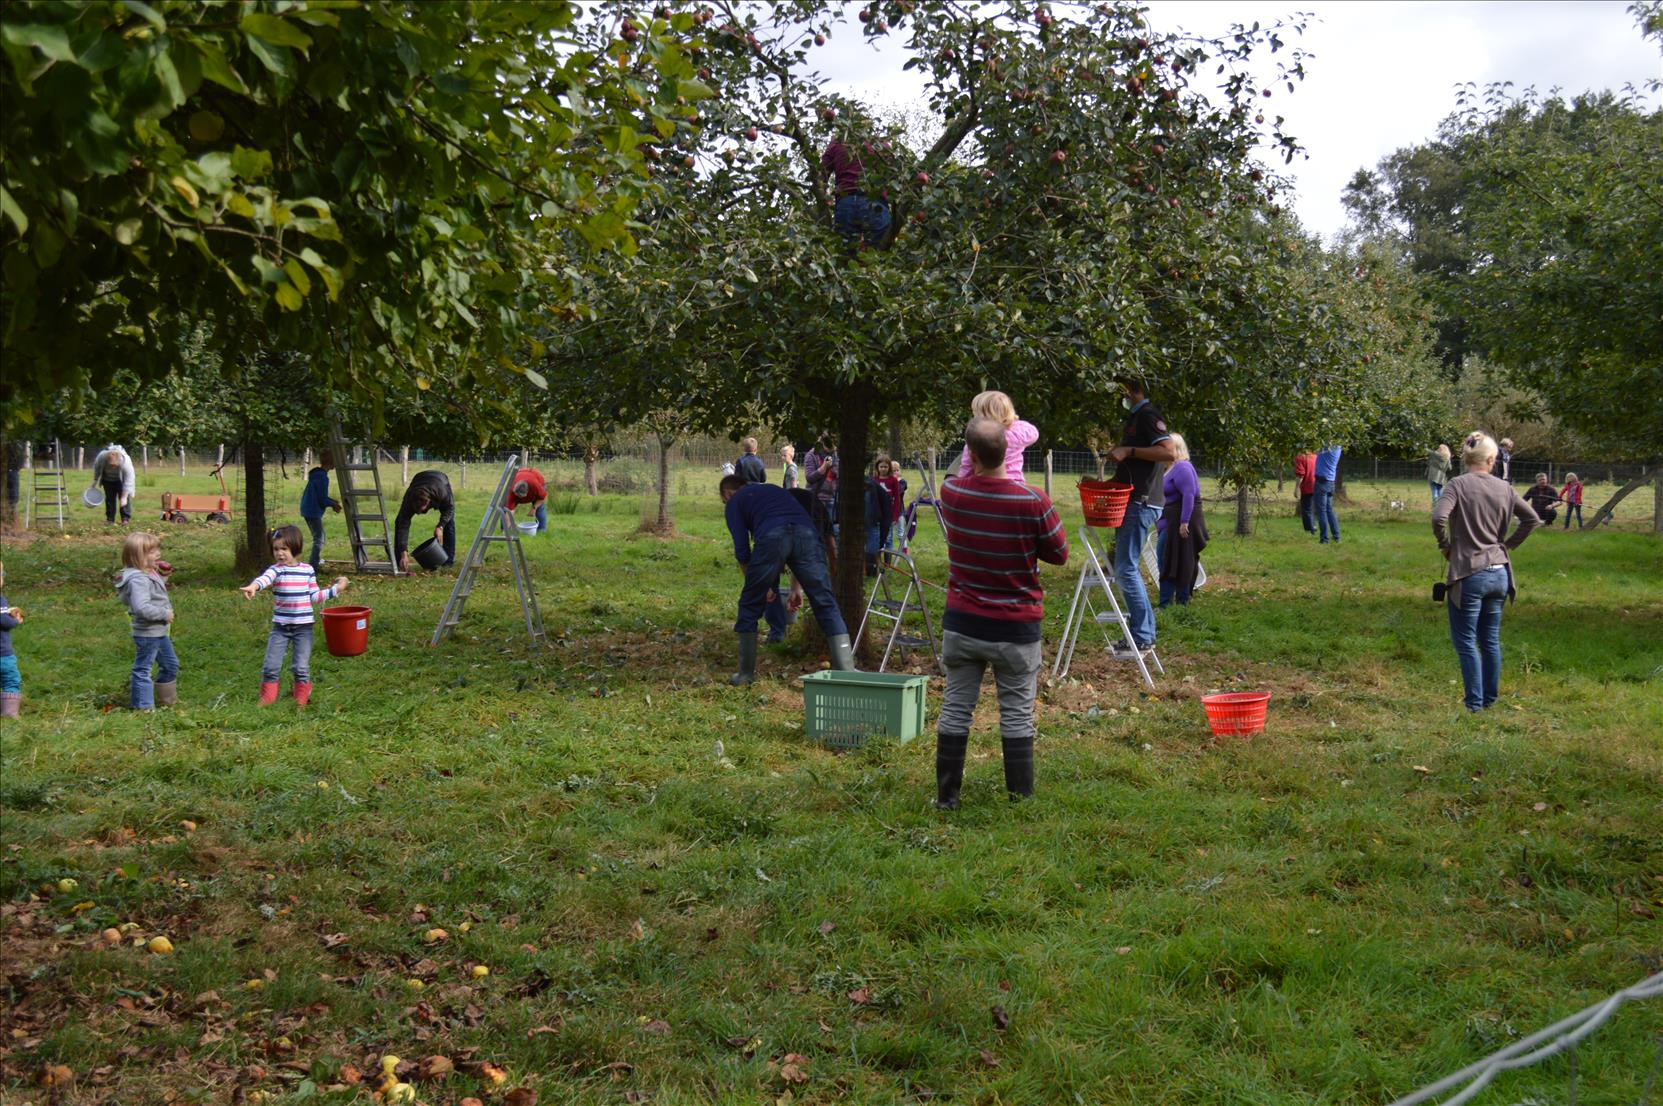 Apfelpflücken am Klünpott in Brockdorf  -   jung und alt helfen begeistert